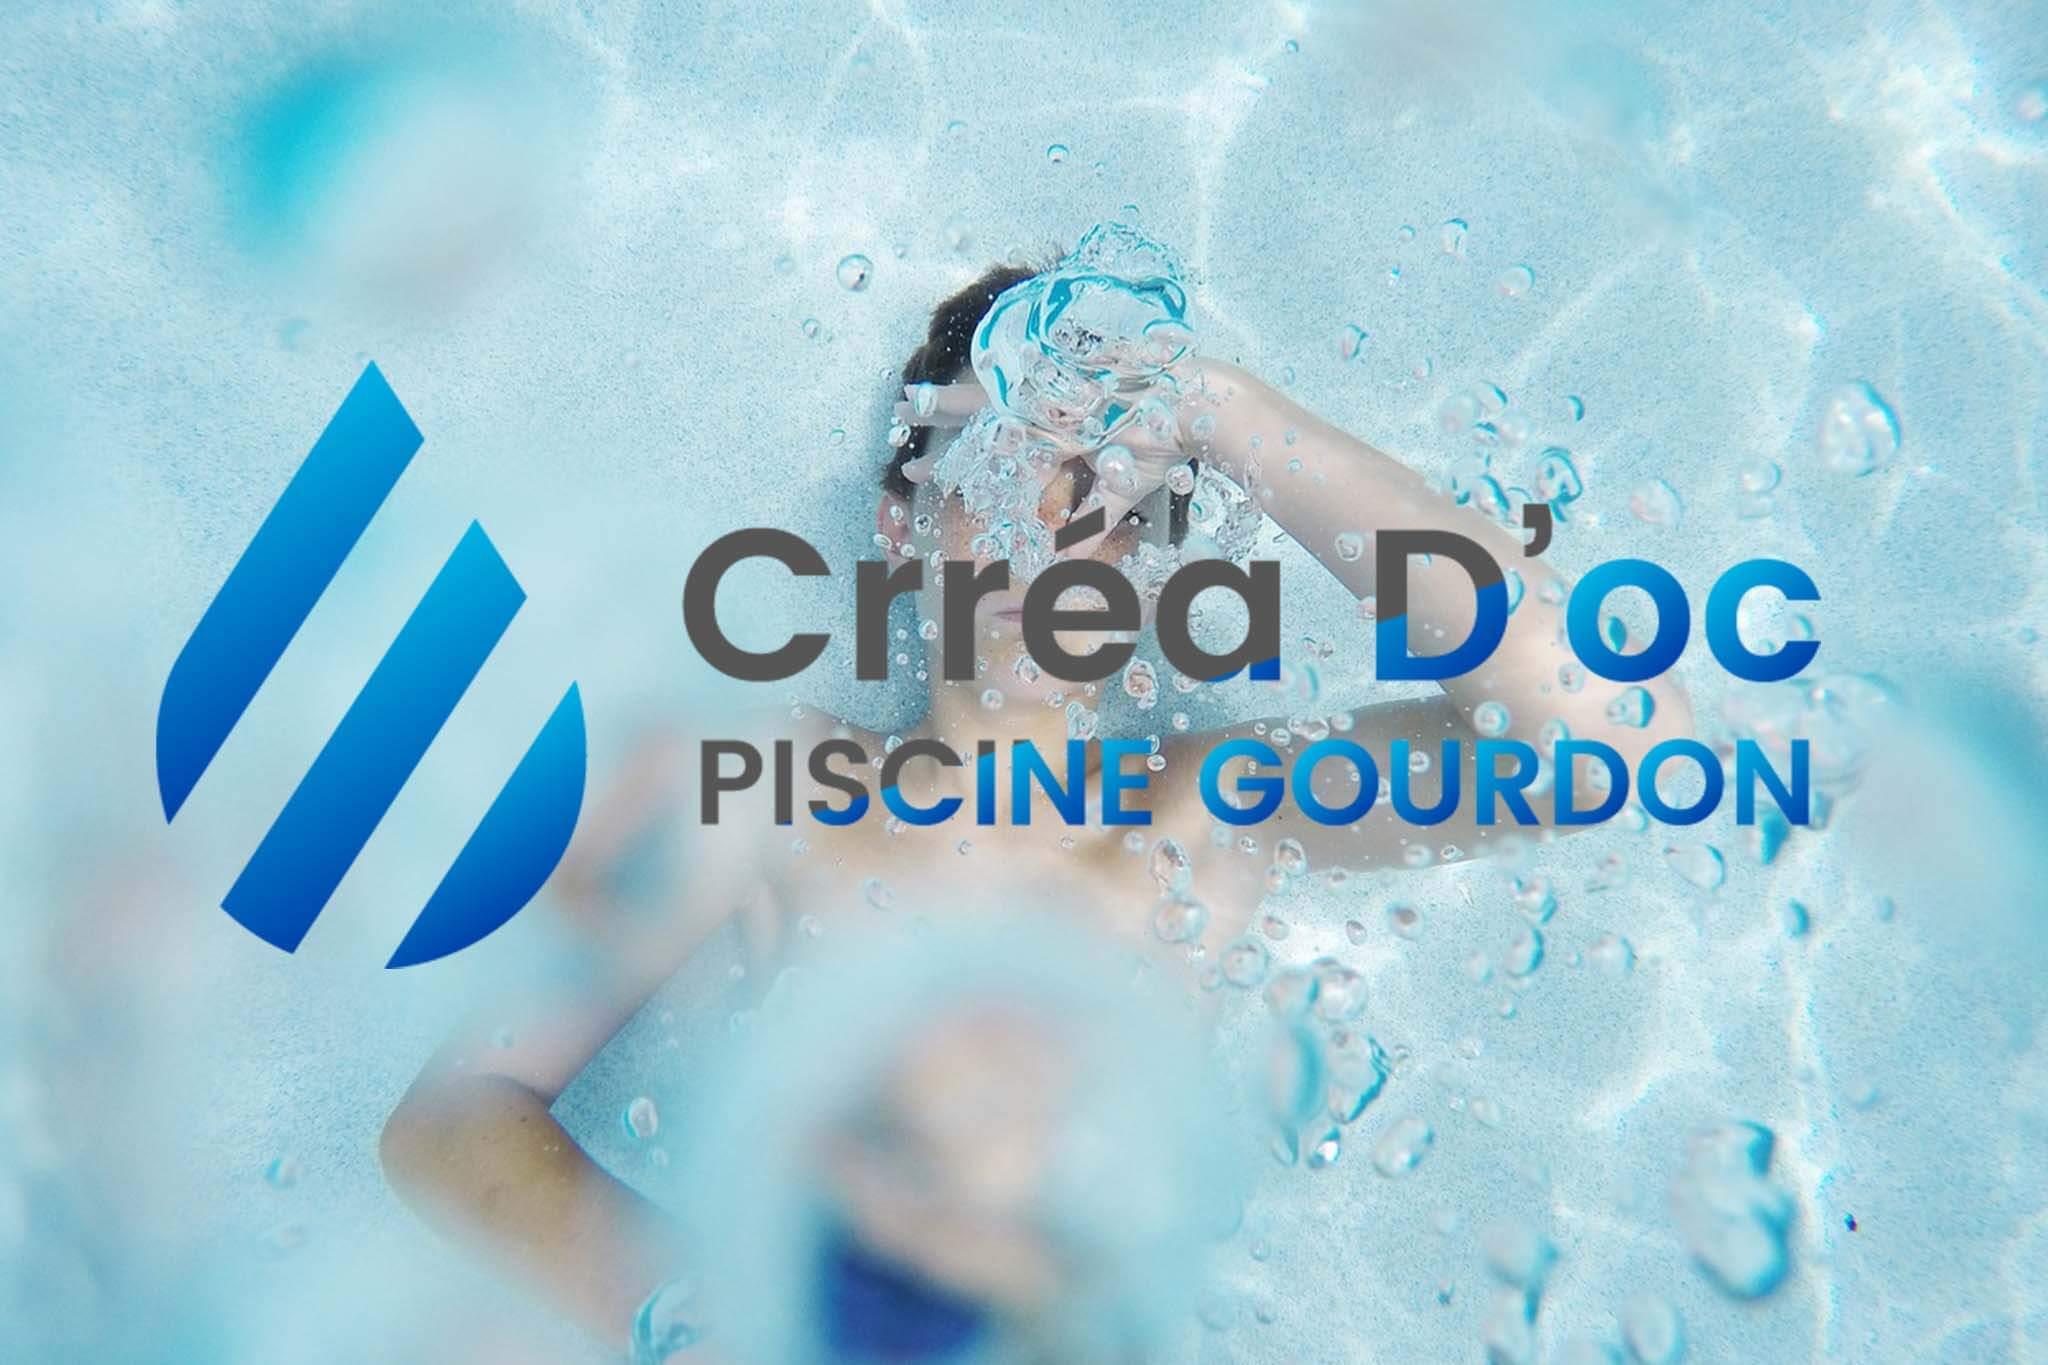 Crr a d 39 oc piscine gourdon lot construction renovation de piscine - Gourdon piscine ...